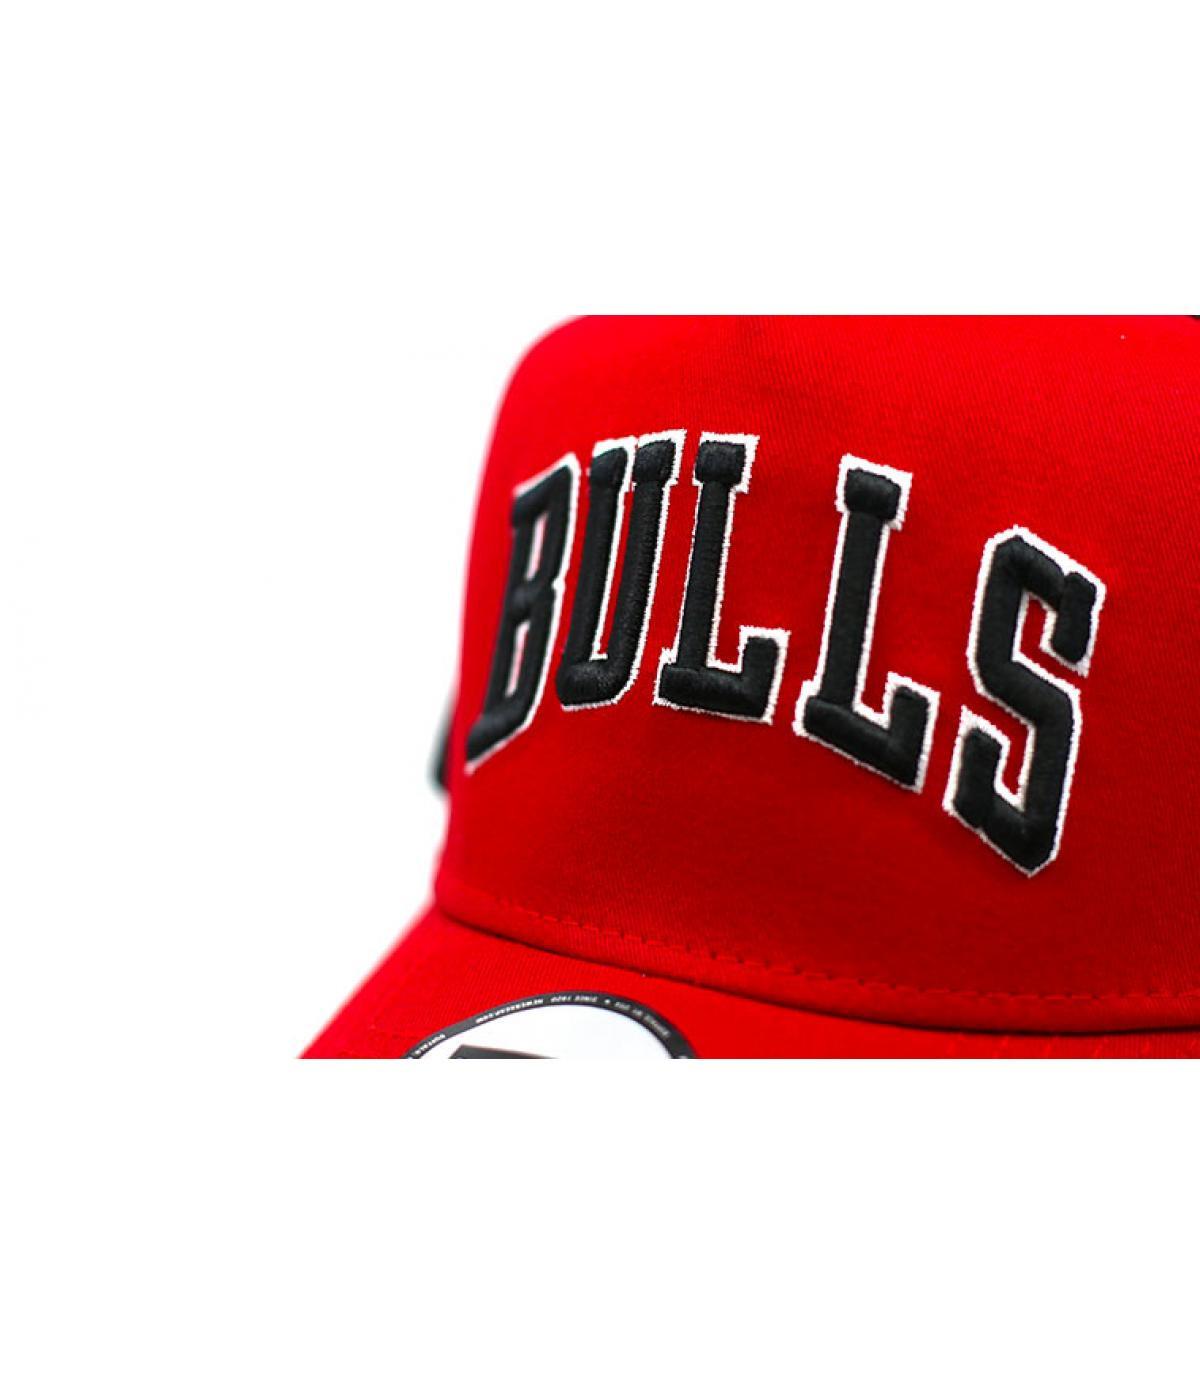 Details Trucker Kids Reverse Team Bulls - afbeeling 3